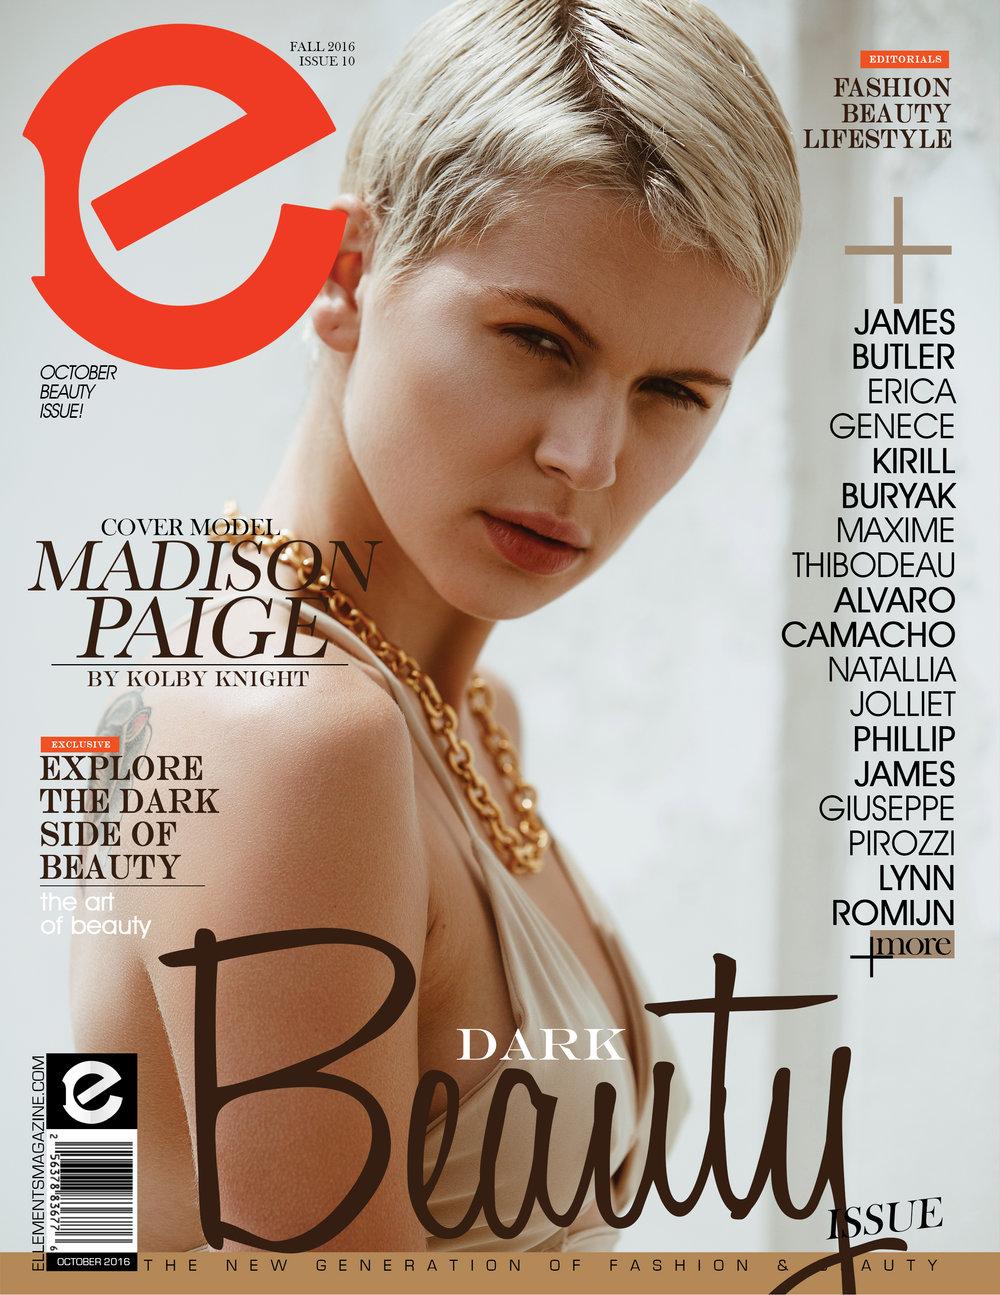 Ellements Magazine , Cover Story Nov 2016